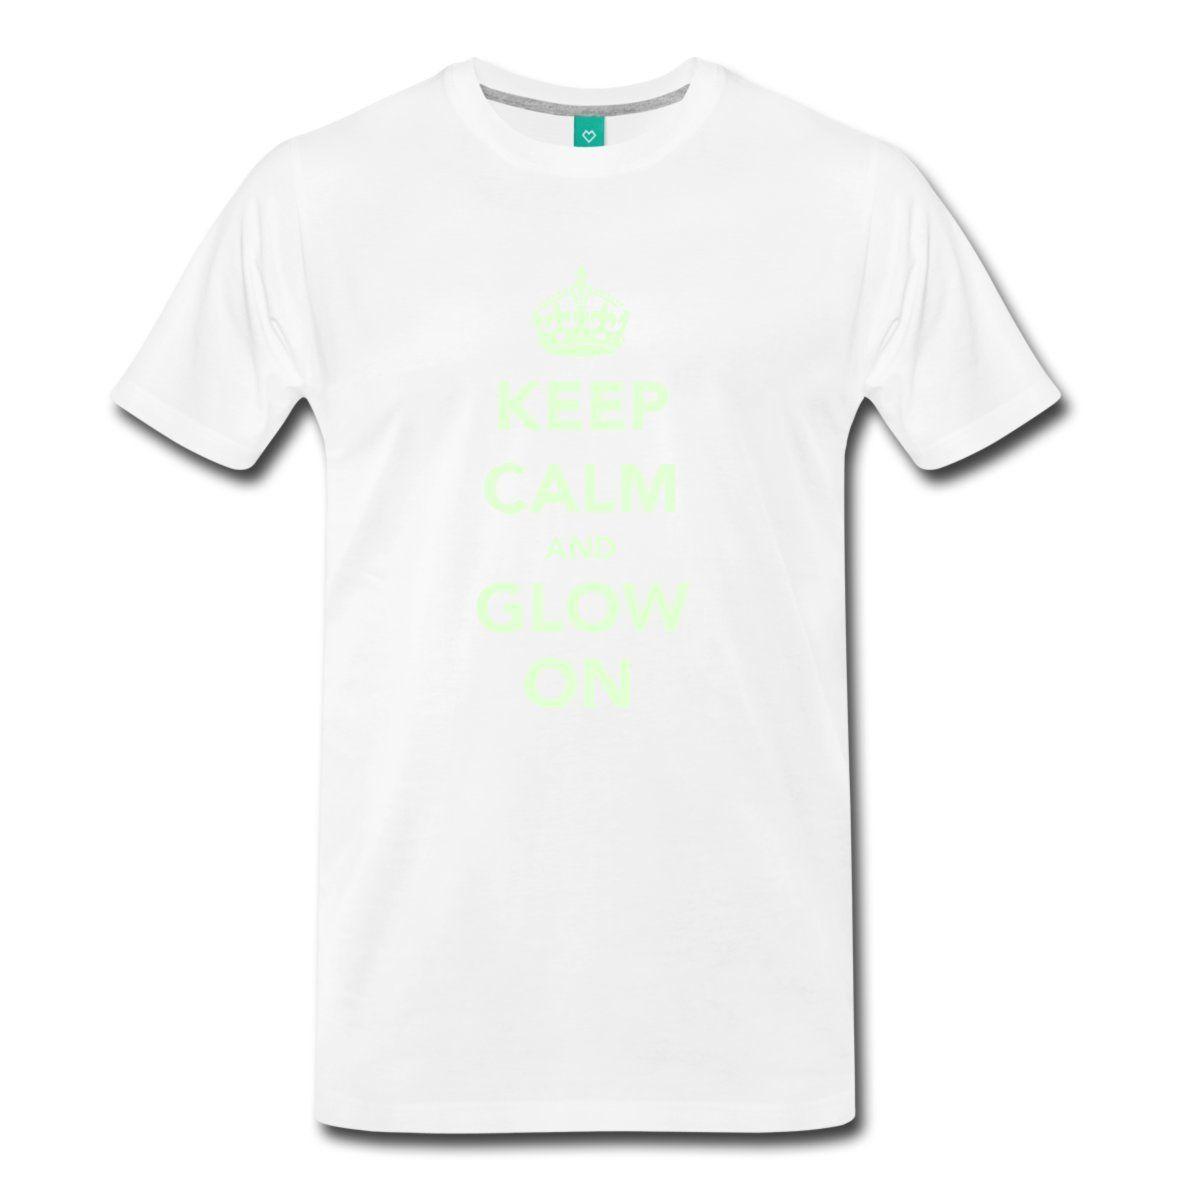 Make At Shirt Online Photo Album - Asianfashion